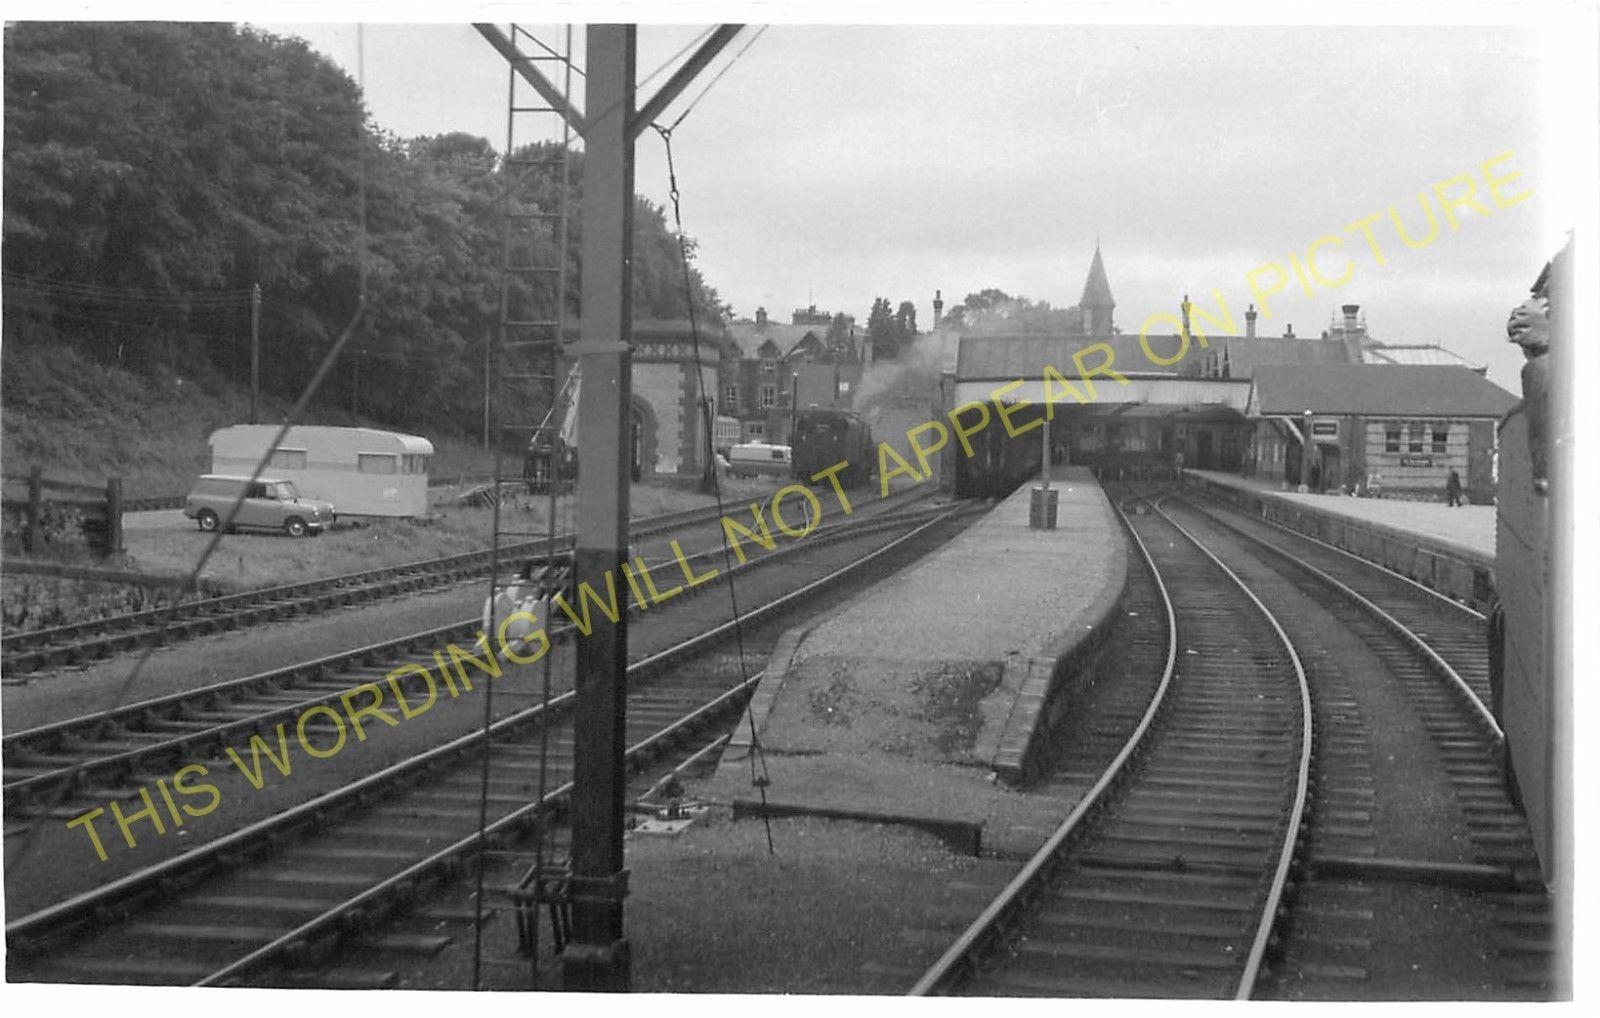 5 Windermere Lakeside Railway Station Photo Haverthwaite and Greenodd Line